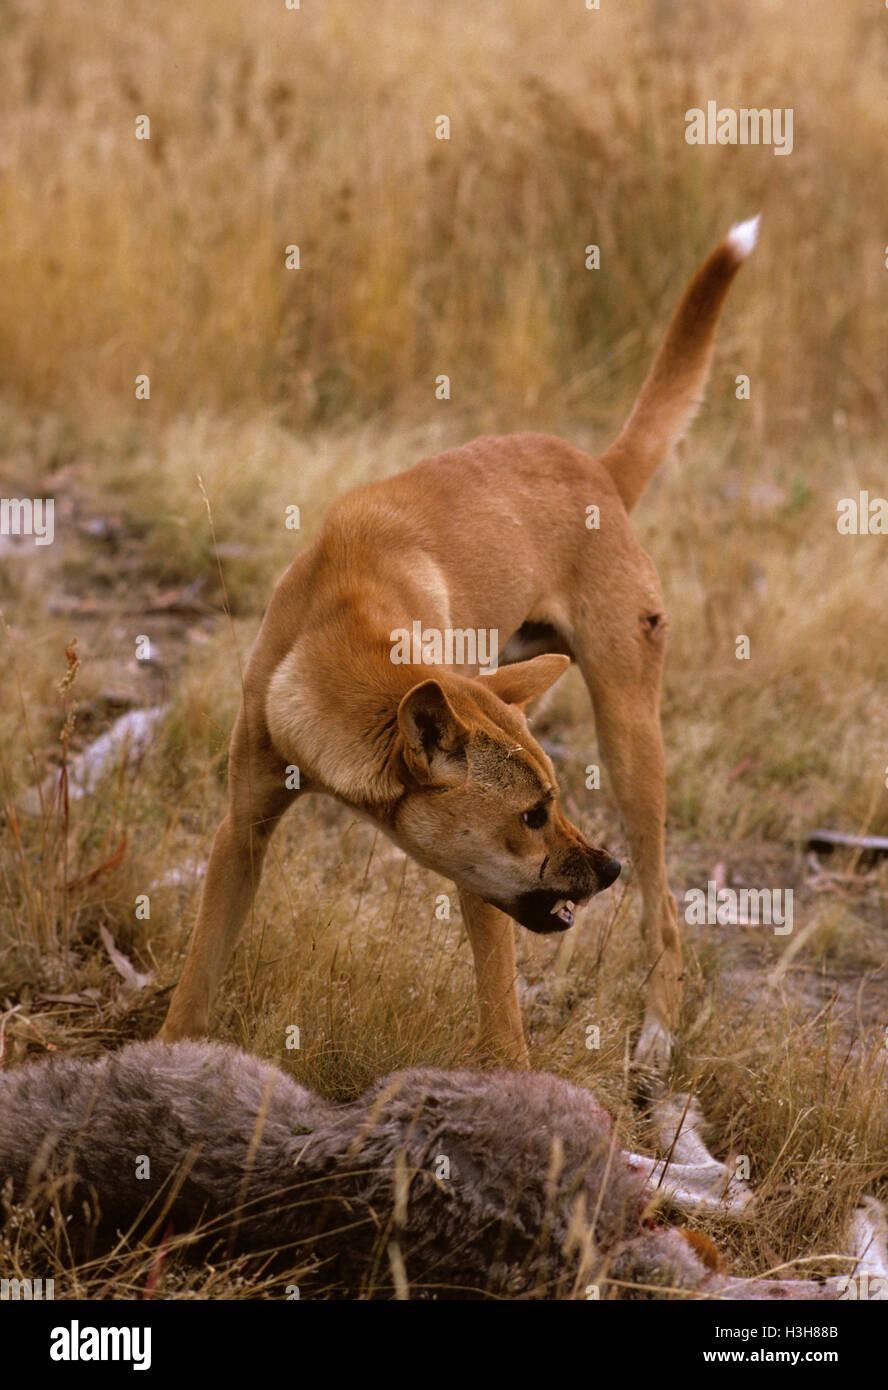 Dingo (Canis dingo) - Stock Image